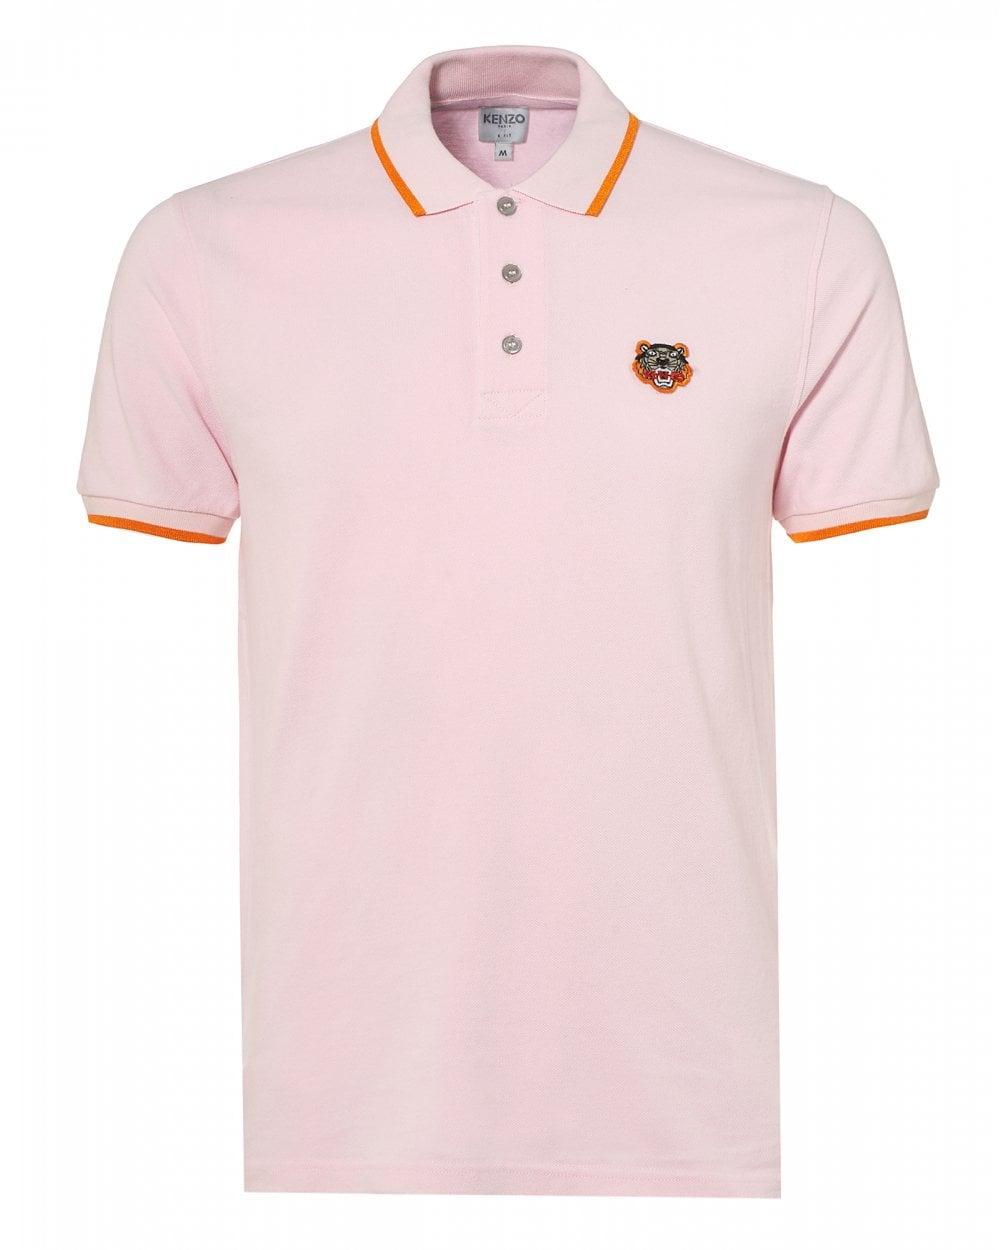 67efbdebd1 Kenzo Mens Tiger Polo Shirt, Tipped Regular Fit Pink Polo